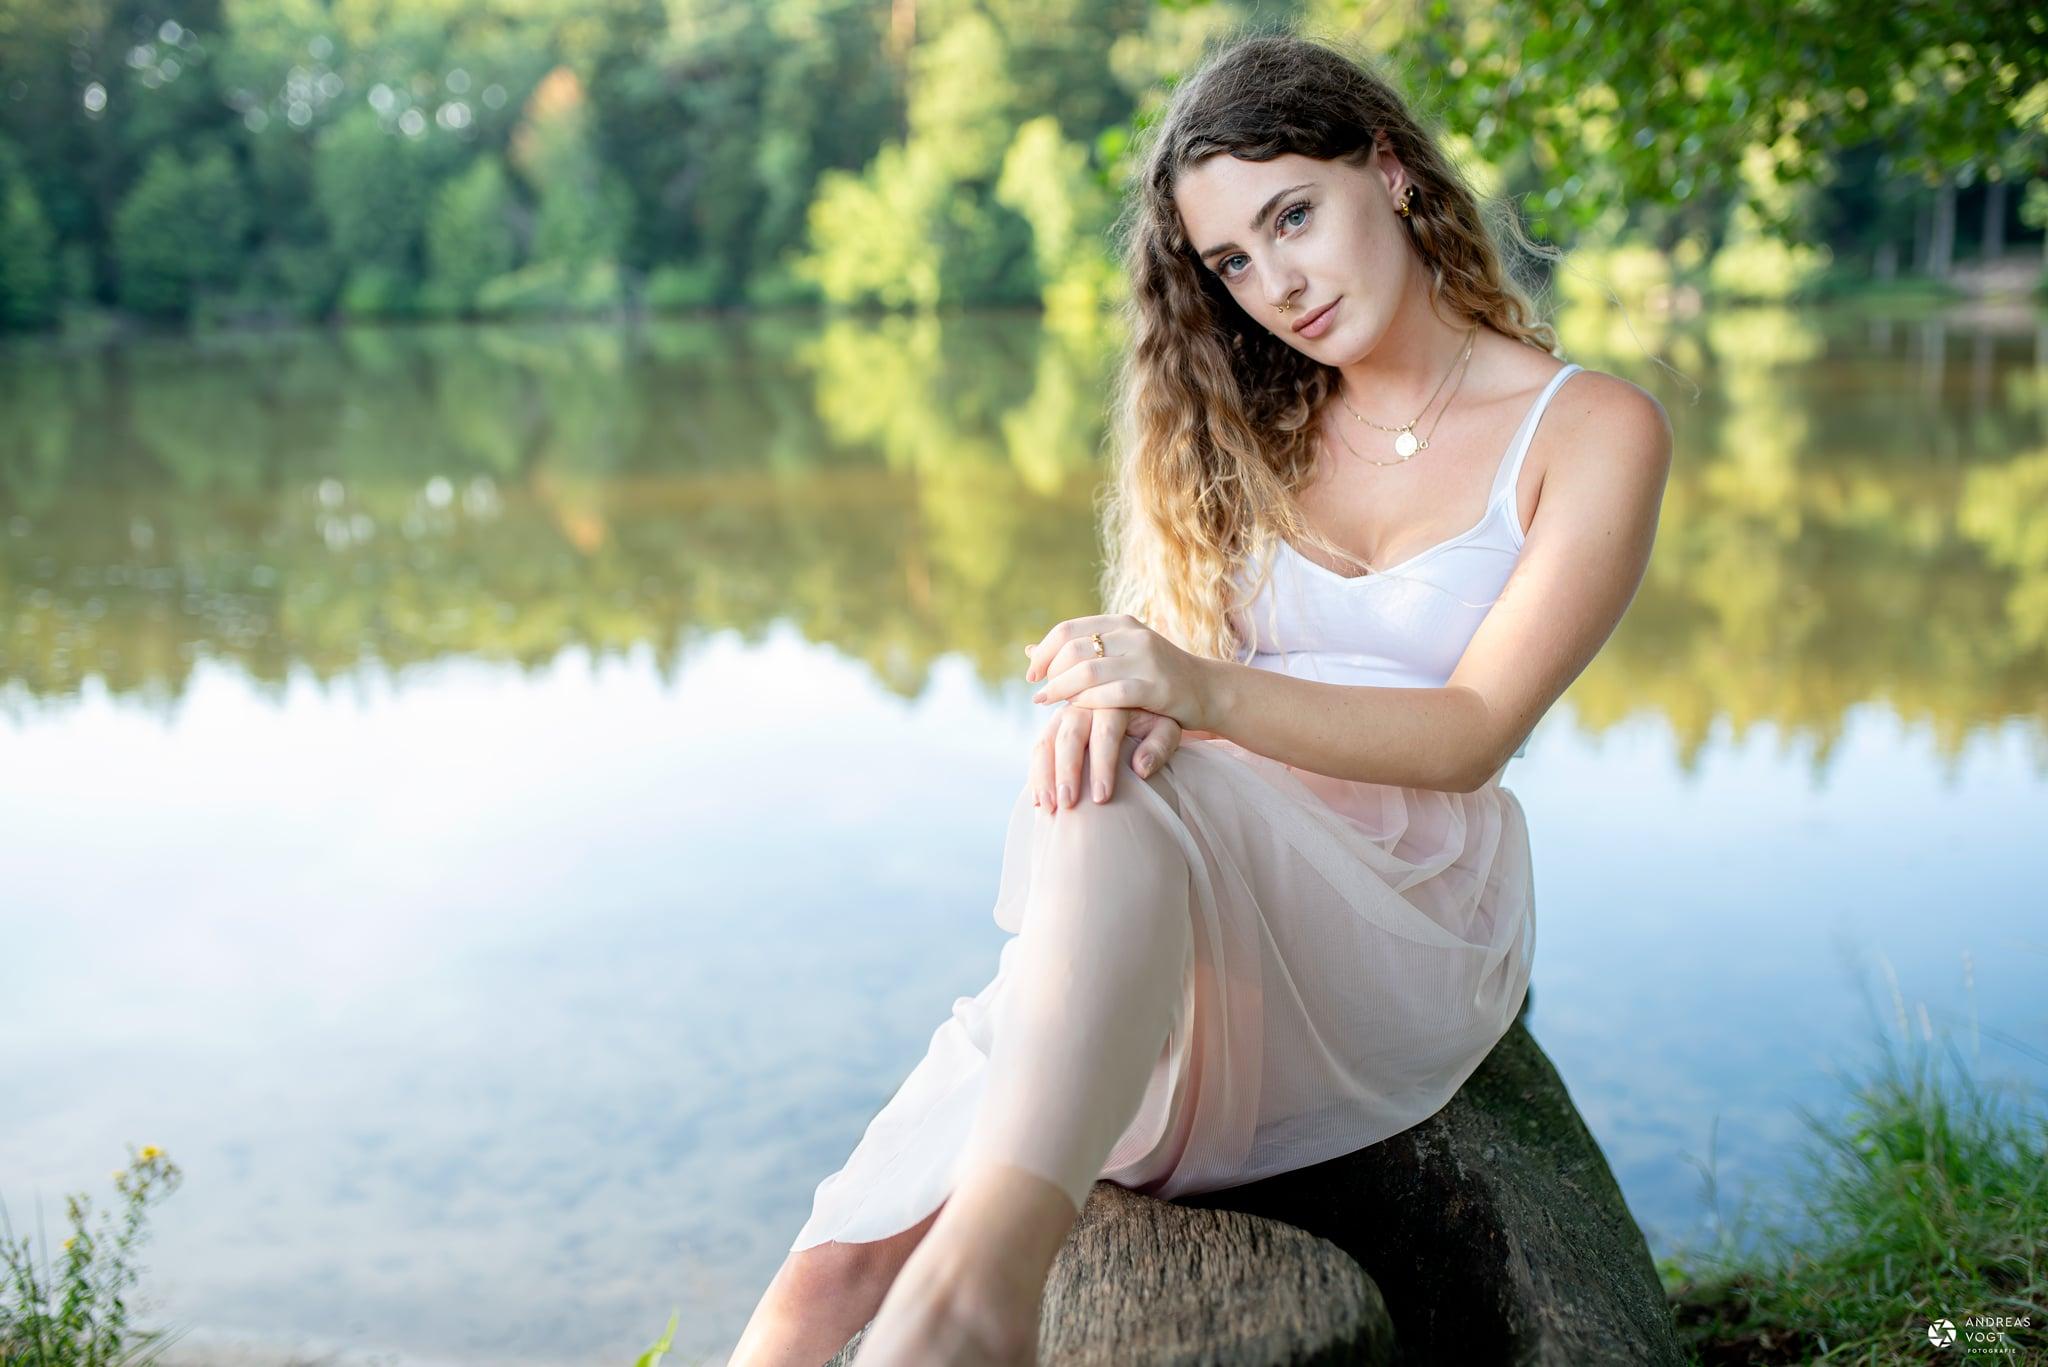 Mit Selina am See - Fotograf Andreas Vogt aus Aalen